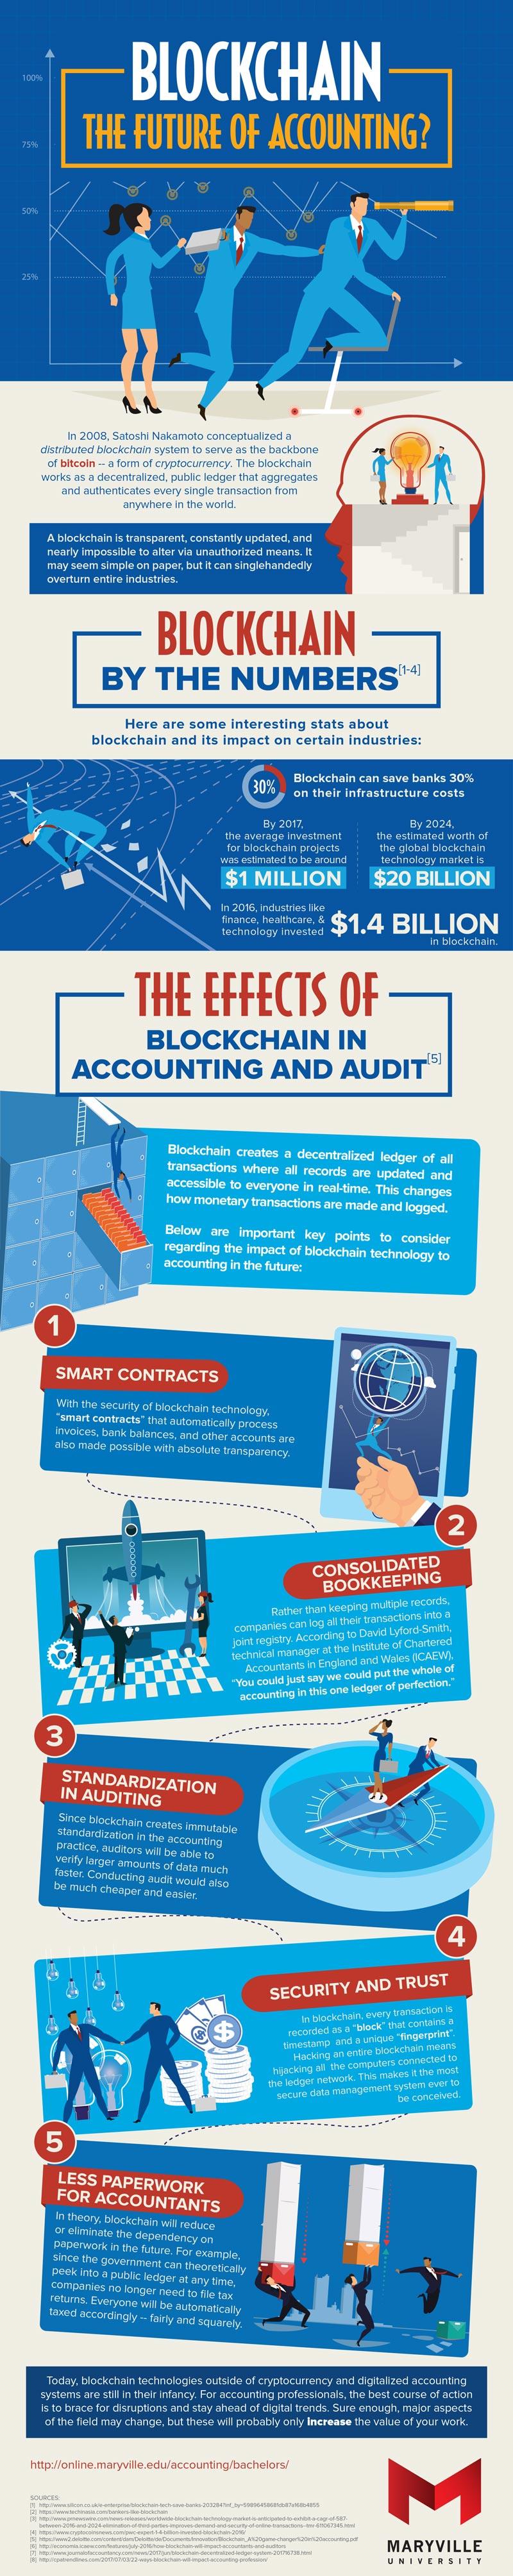 MVU-BSACC-Blockchain-The-Future-of-Accounting-1